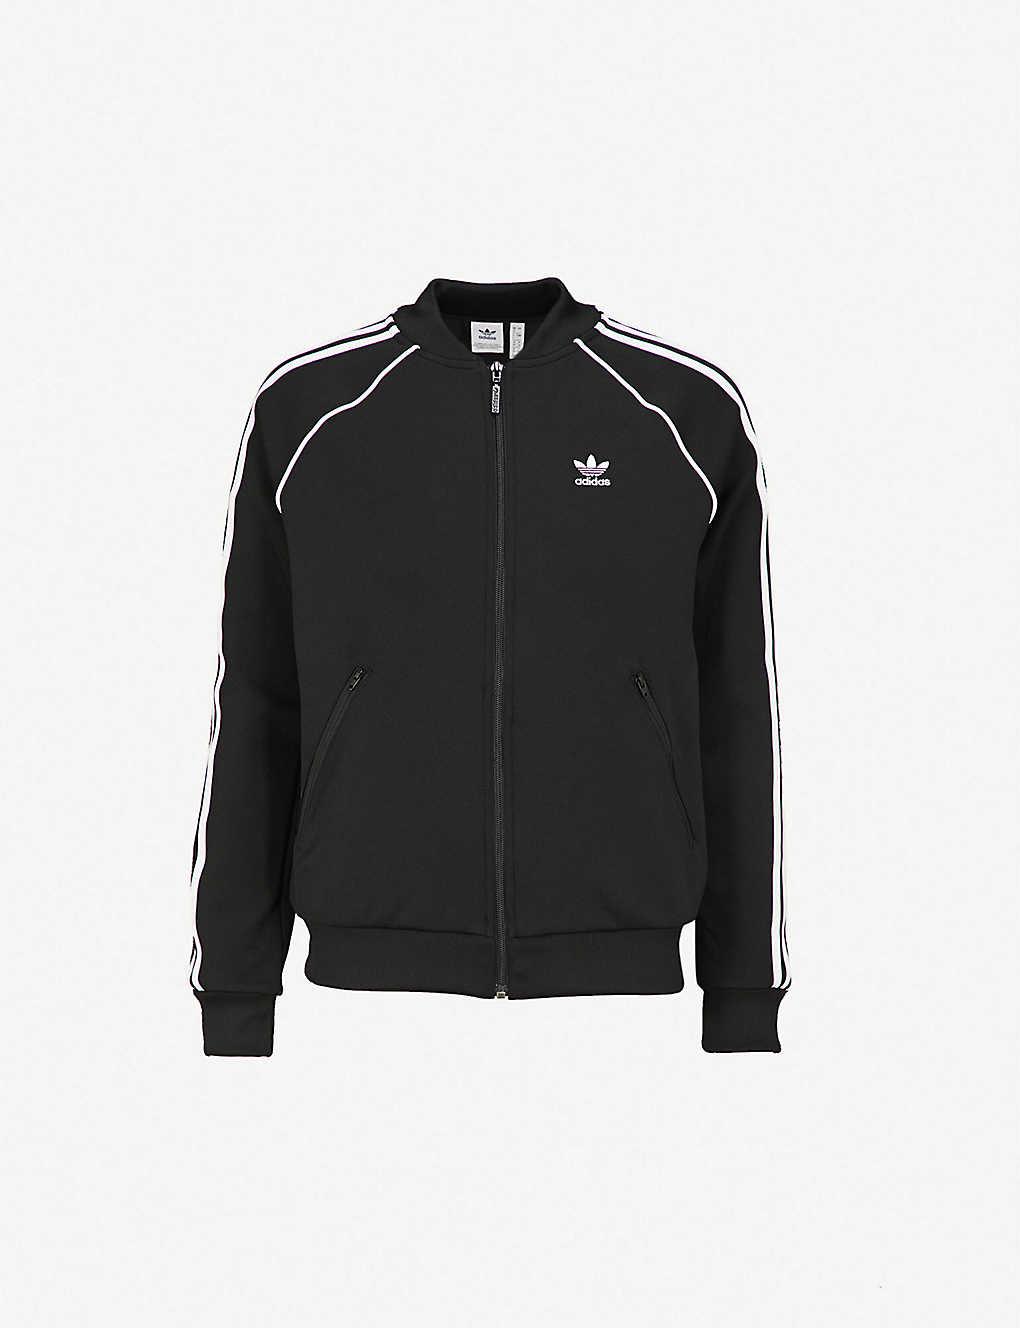 ADIDAS ORIGINALS - Striped jersey jacket   Selfridges.com 470f3350a1